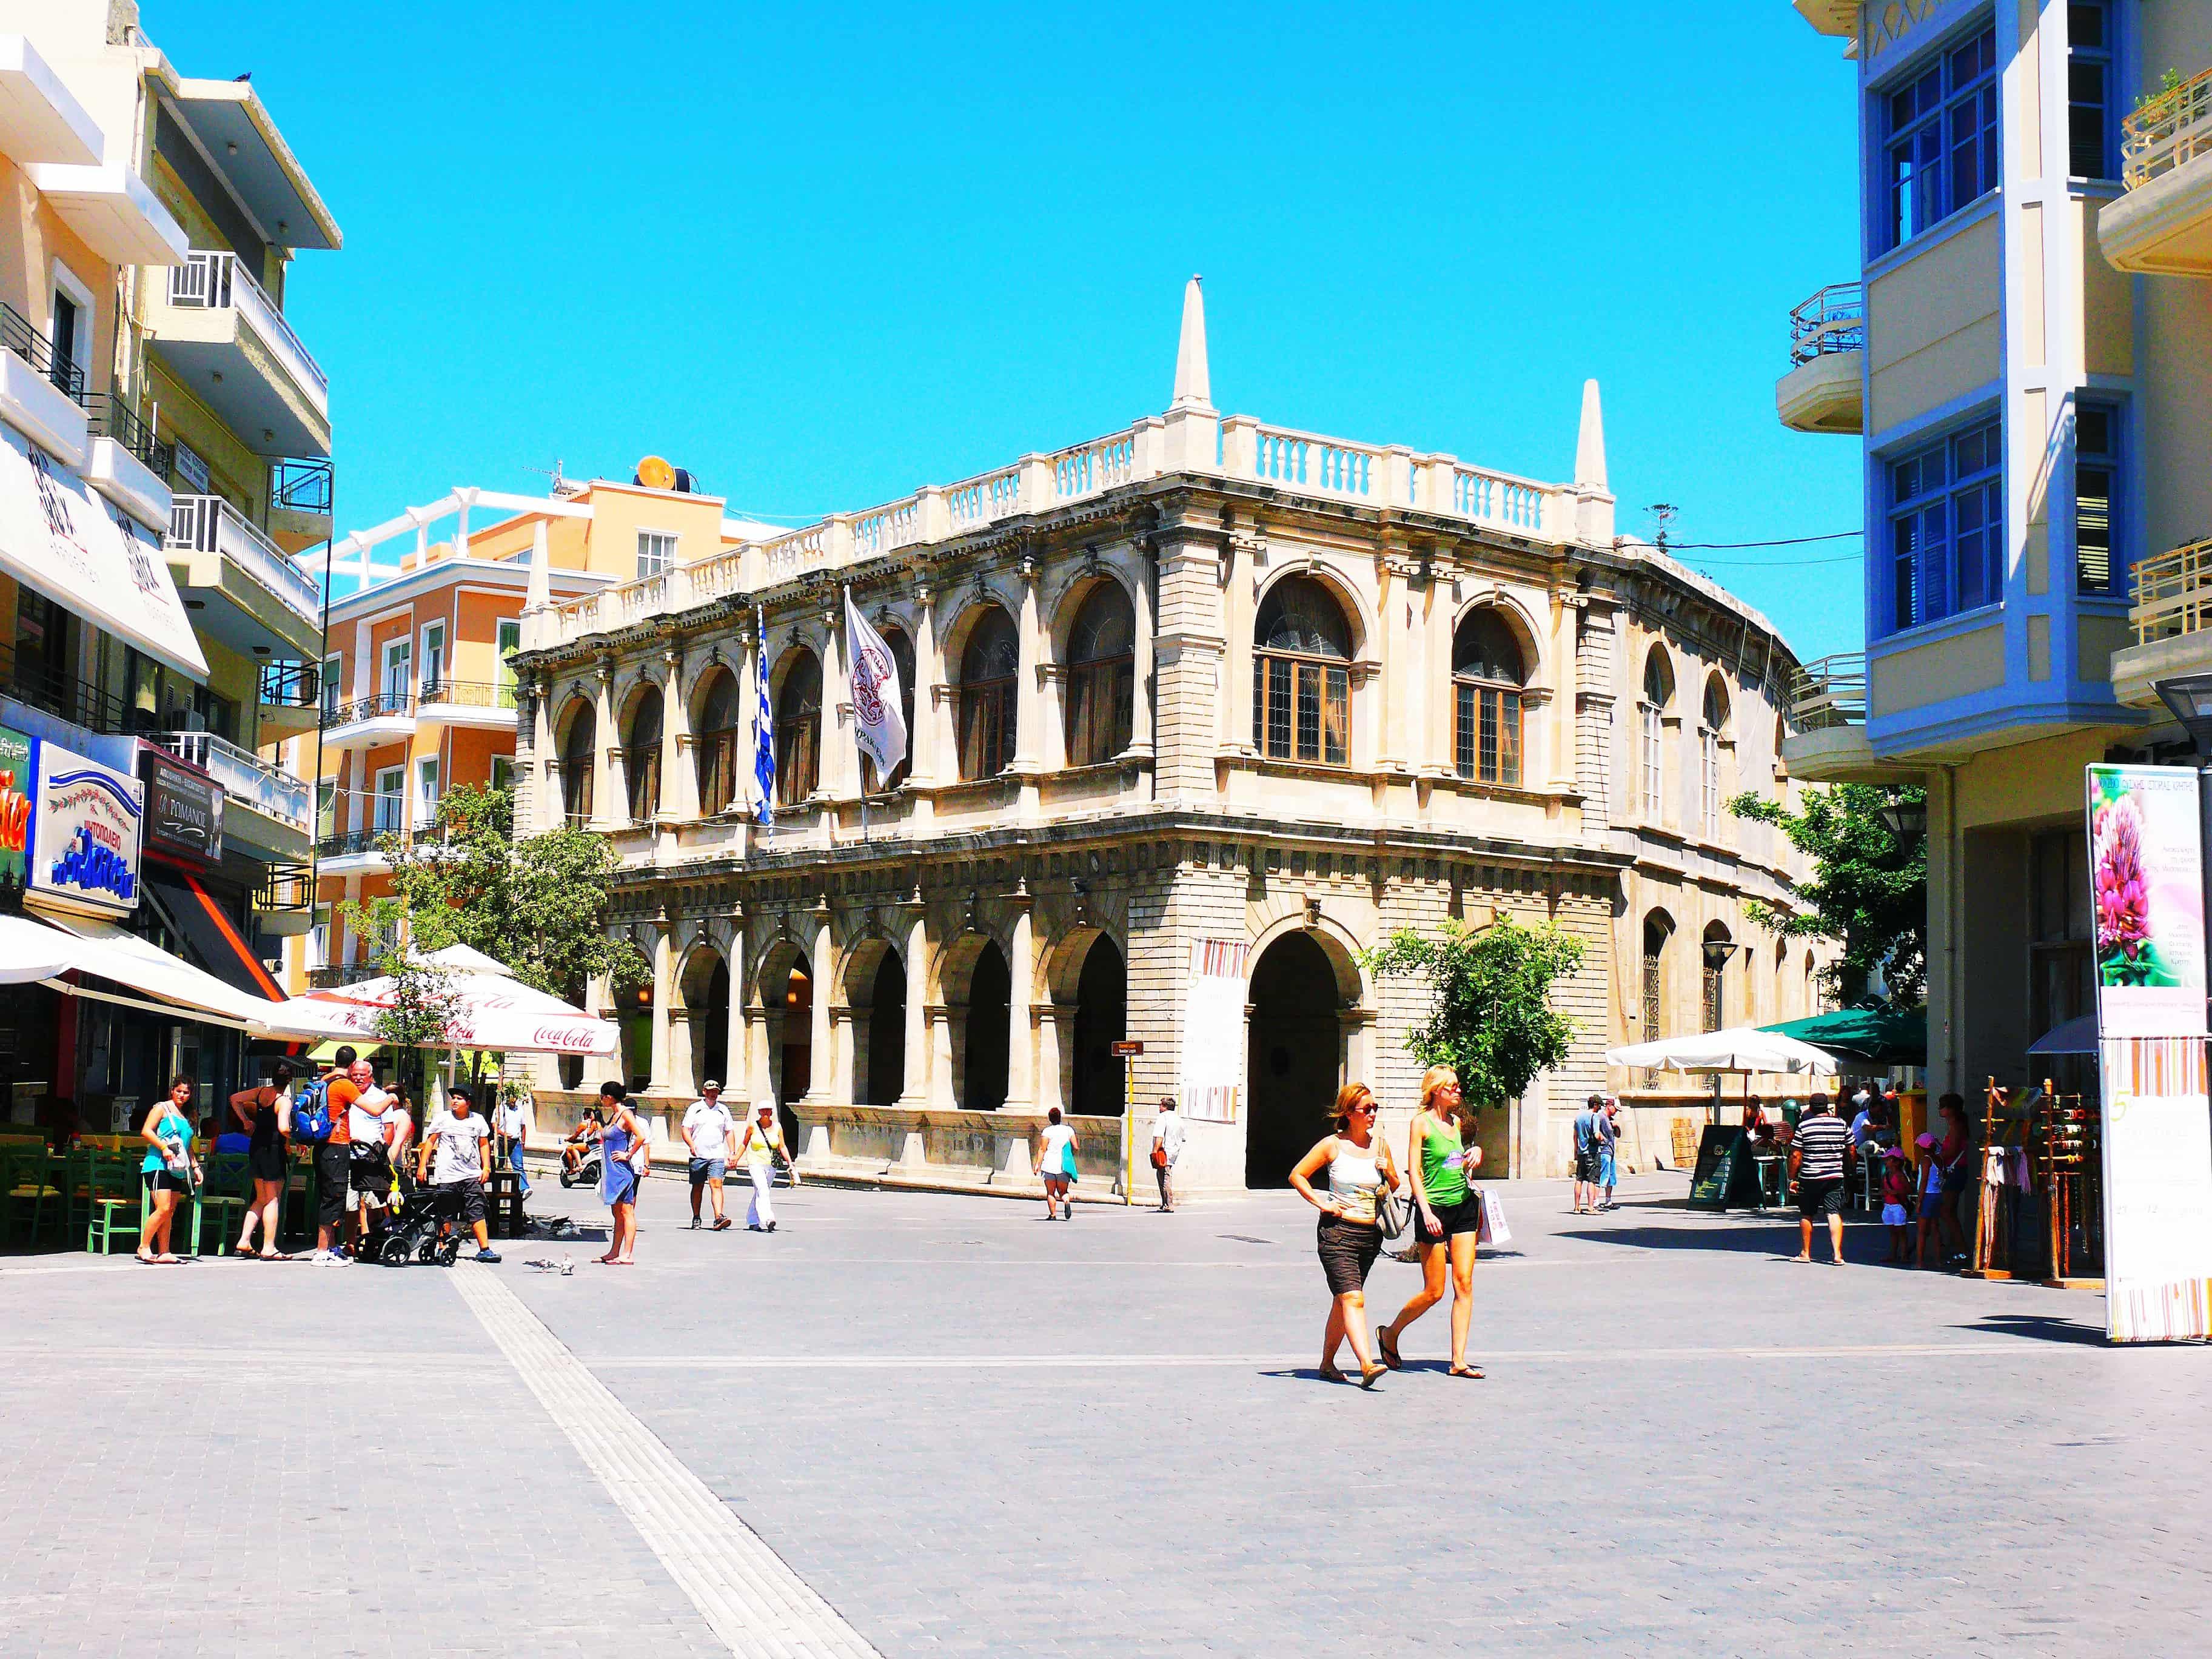 Heraklion town - Heraklion/Knossos - Bali